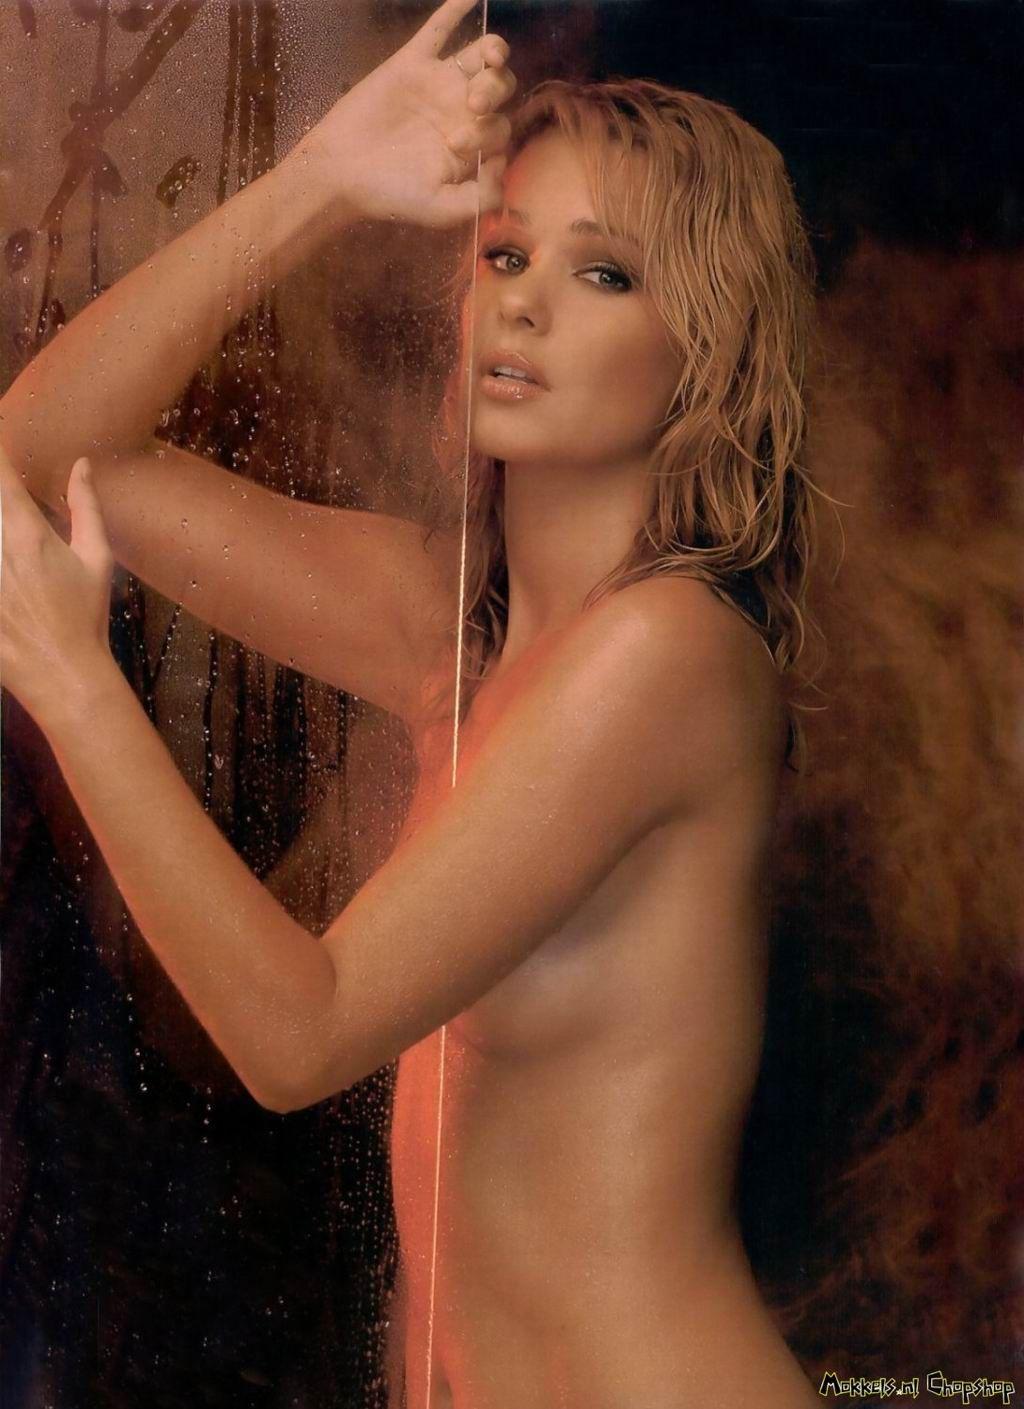 xxx thailand beauty naked girls